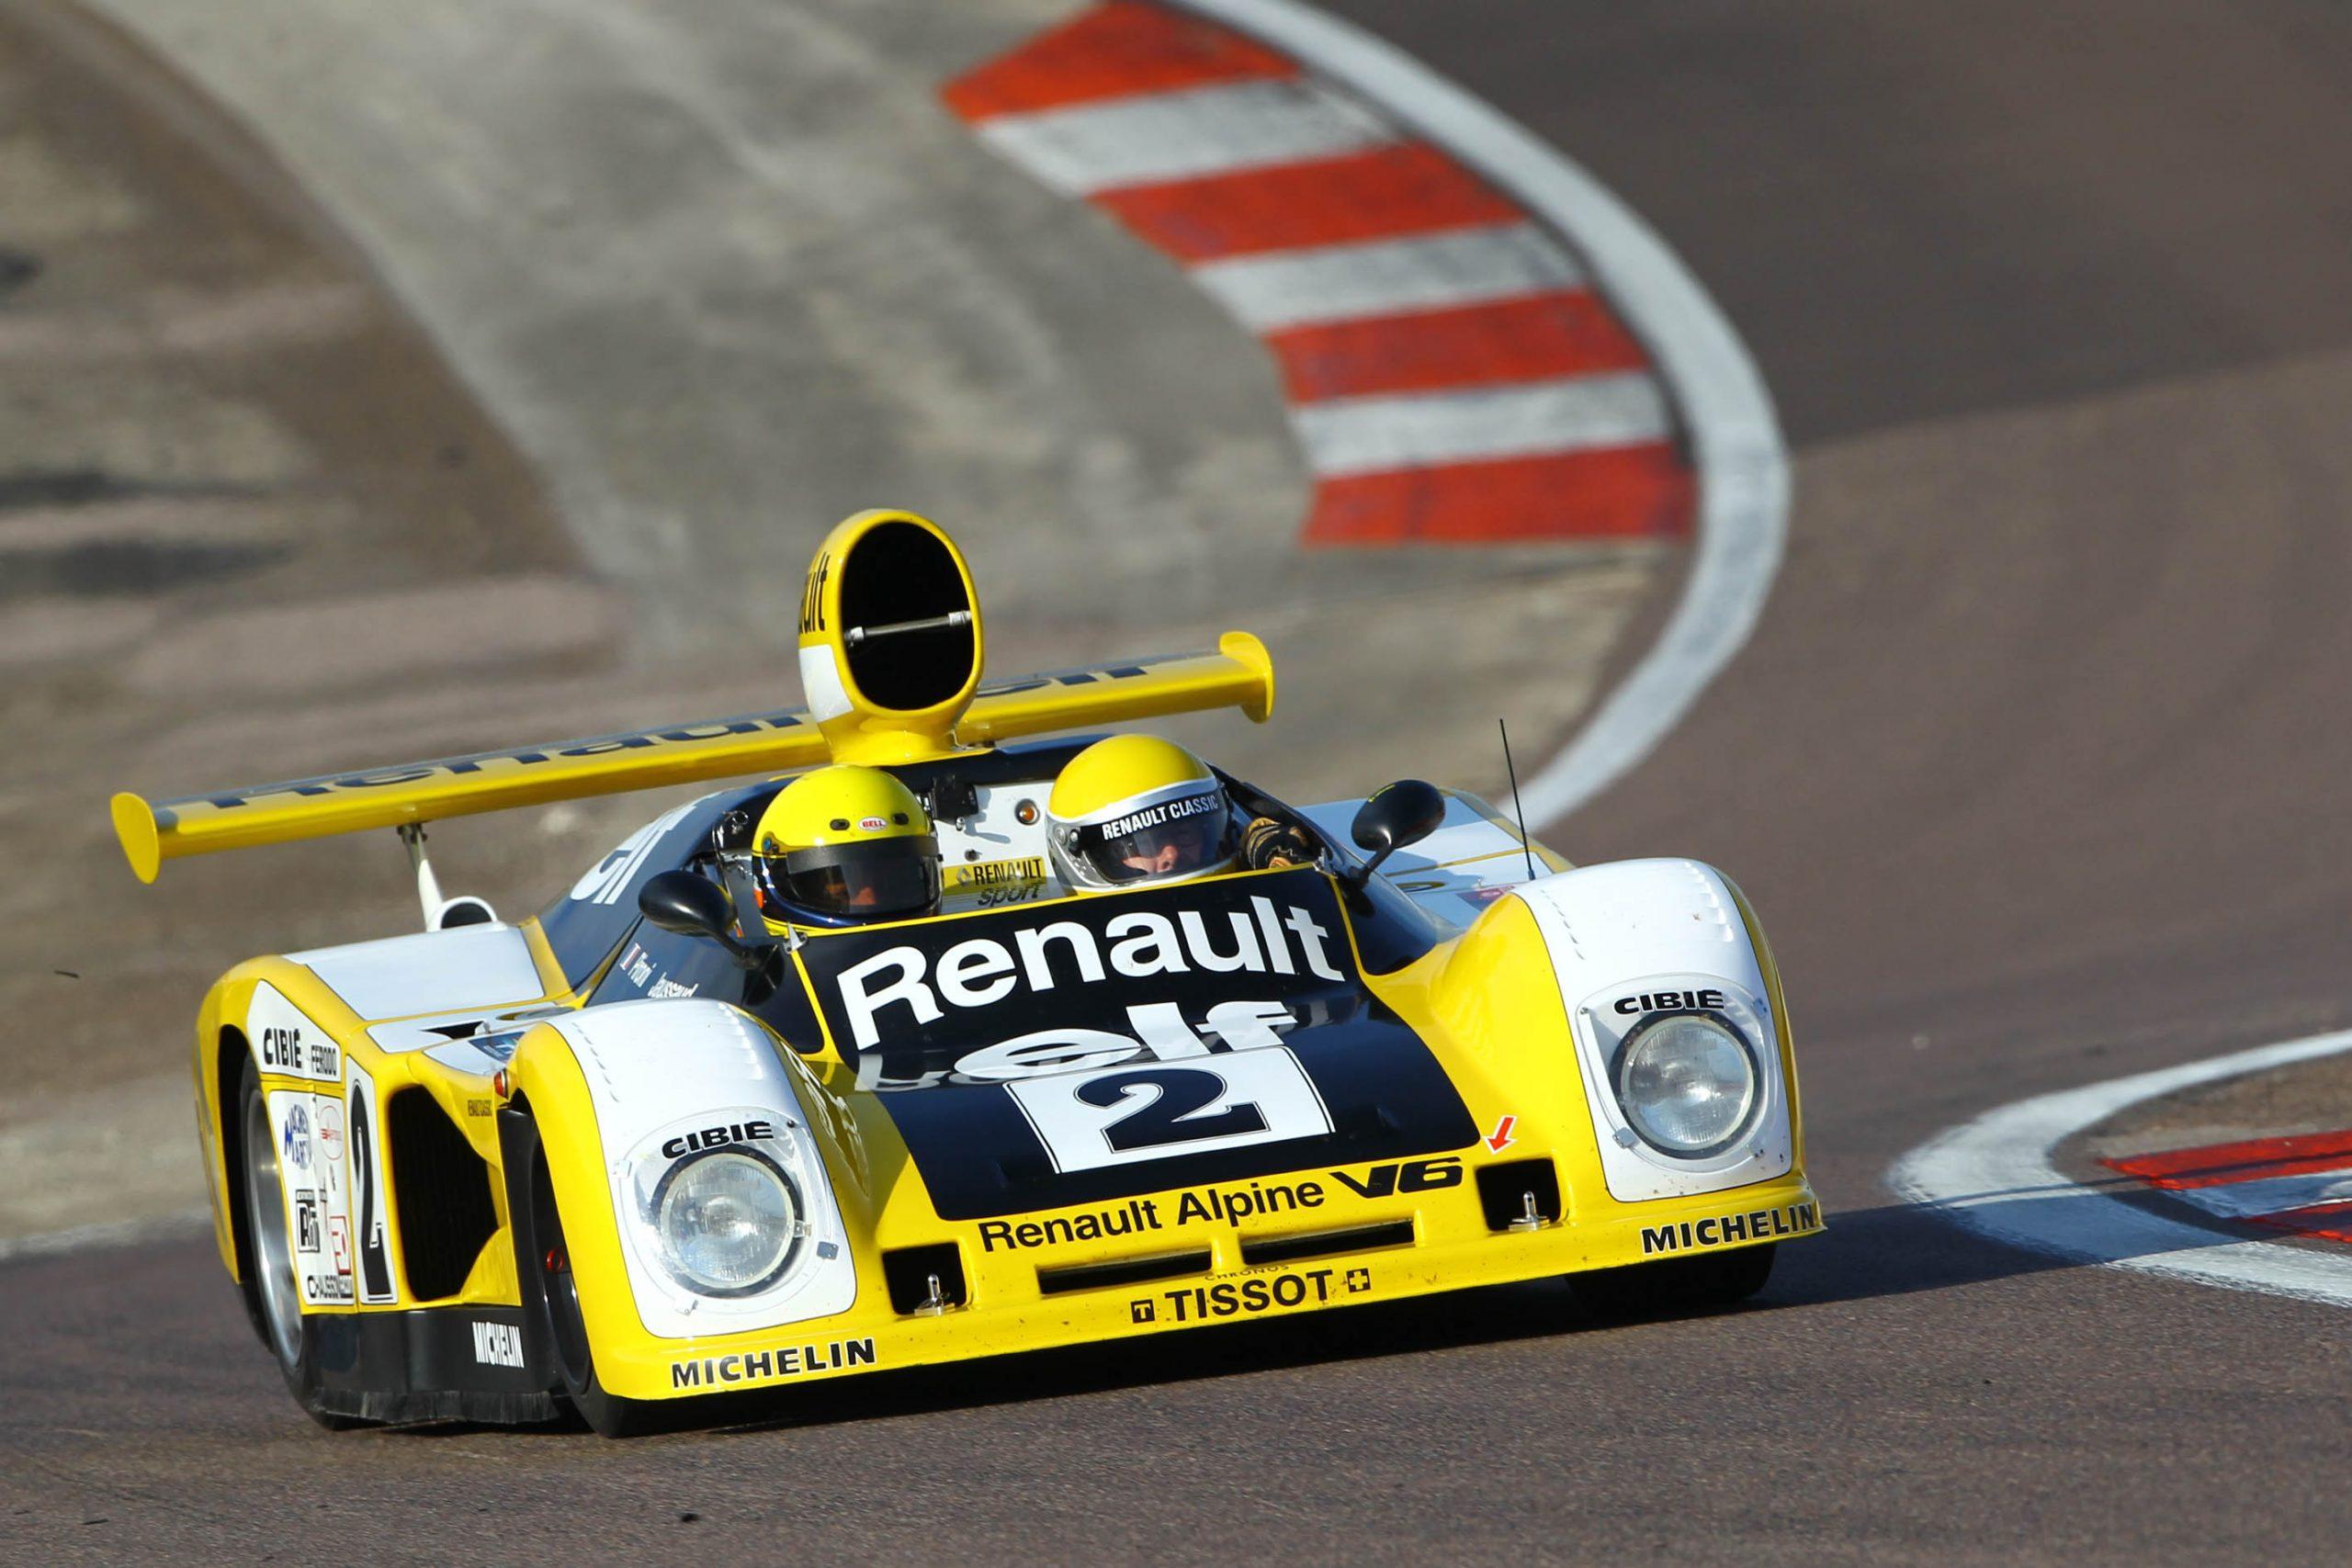 F1 Alpine Renault